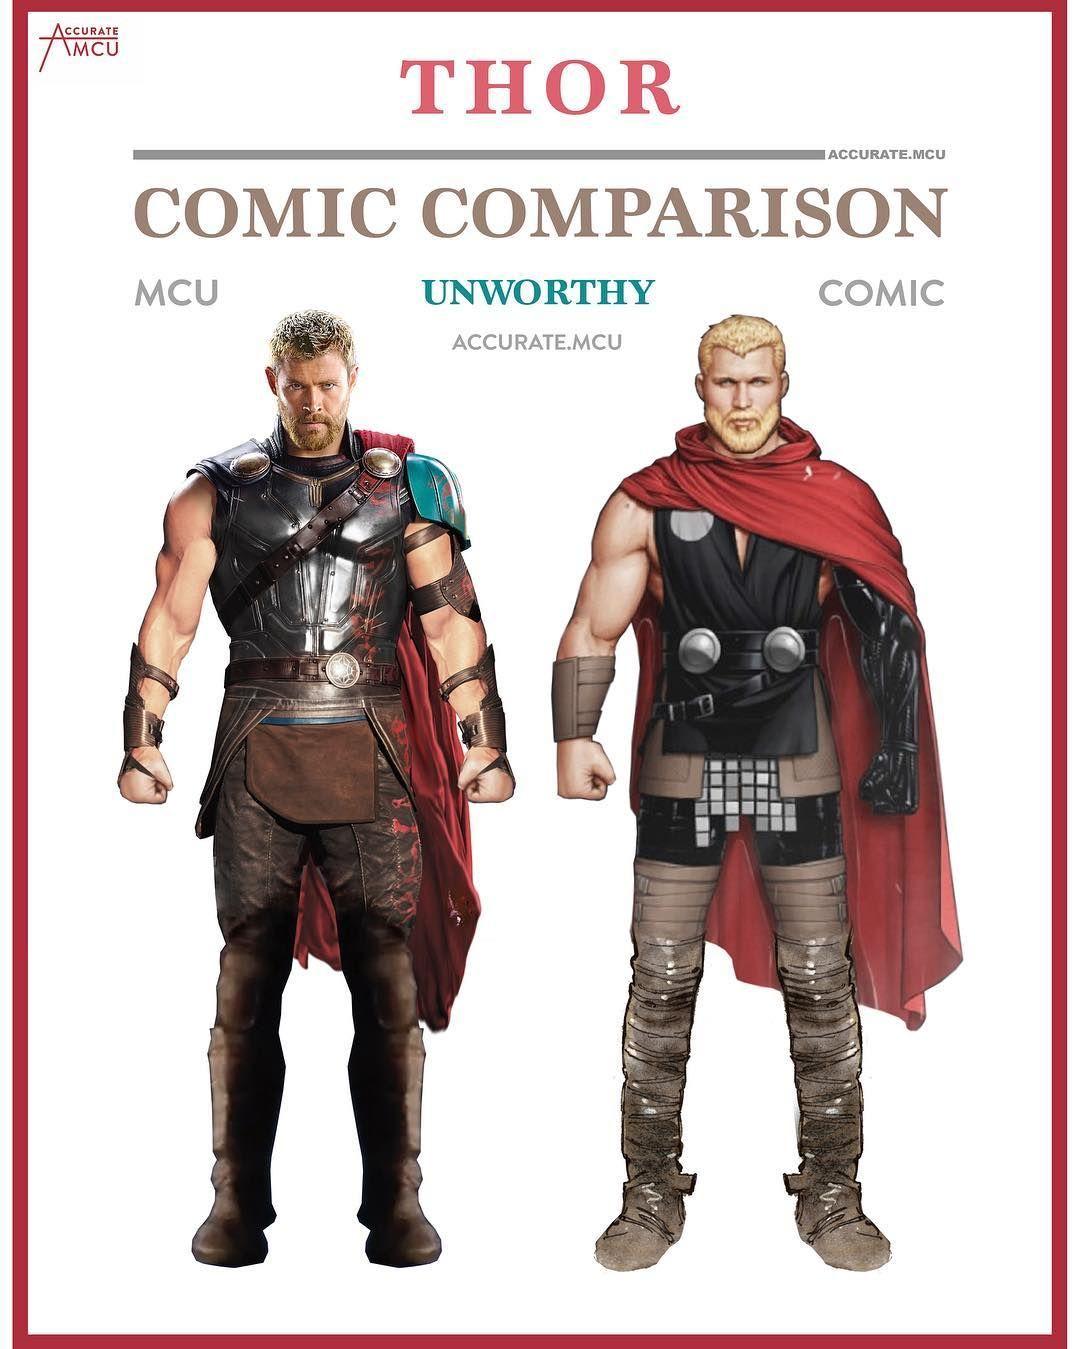 20 5k Likes 226 Comments Accurate Mcu Mcu Fanpage Accurate Mcu On Instagram Unworthy Thor Comic Comparison Thor Comic Marvel Superheroes Comics